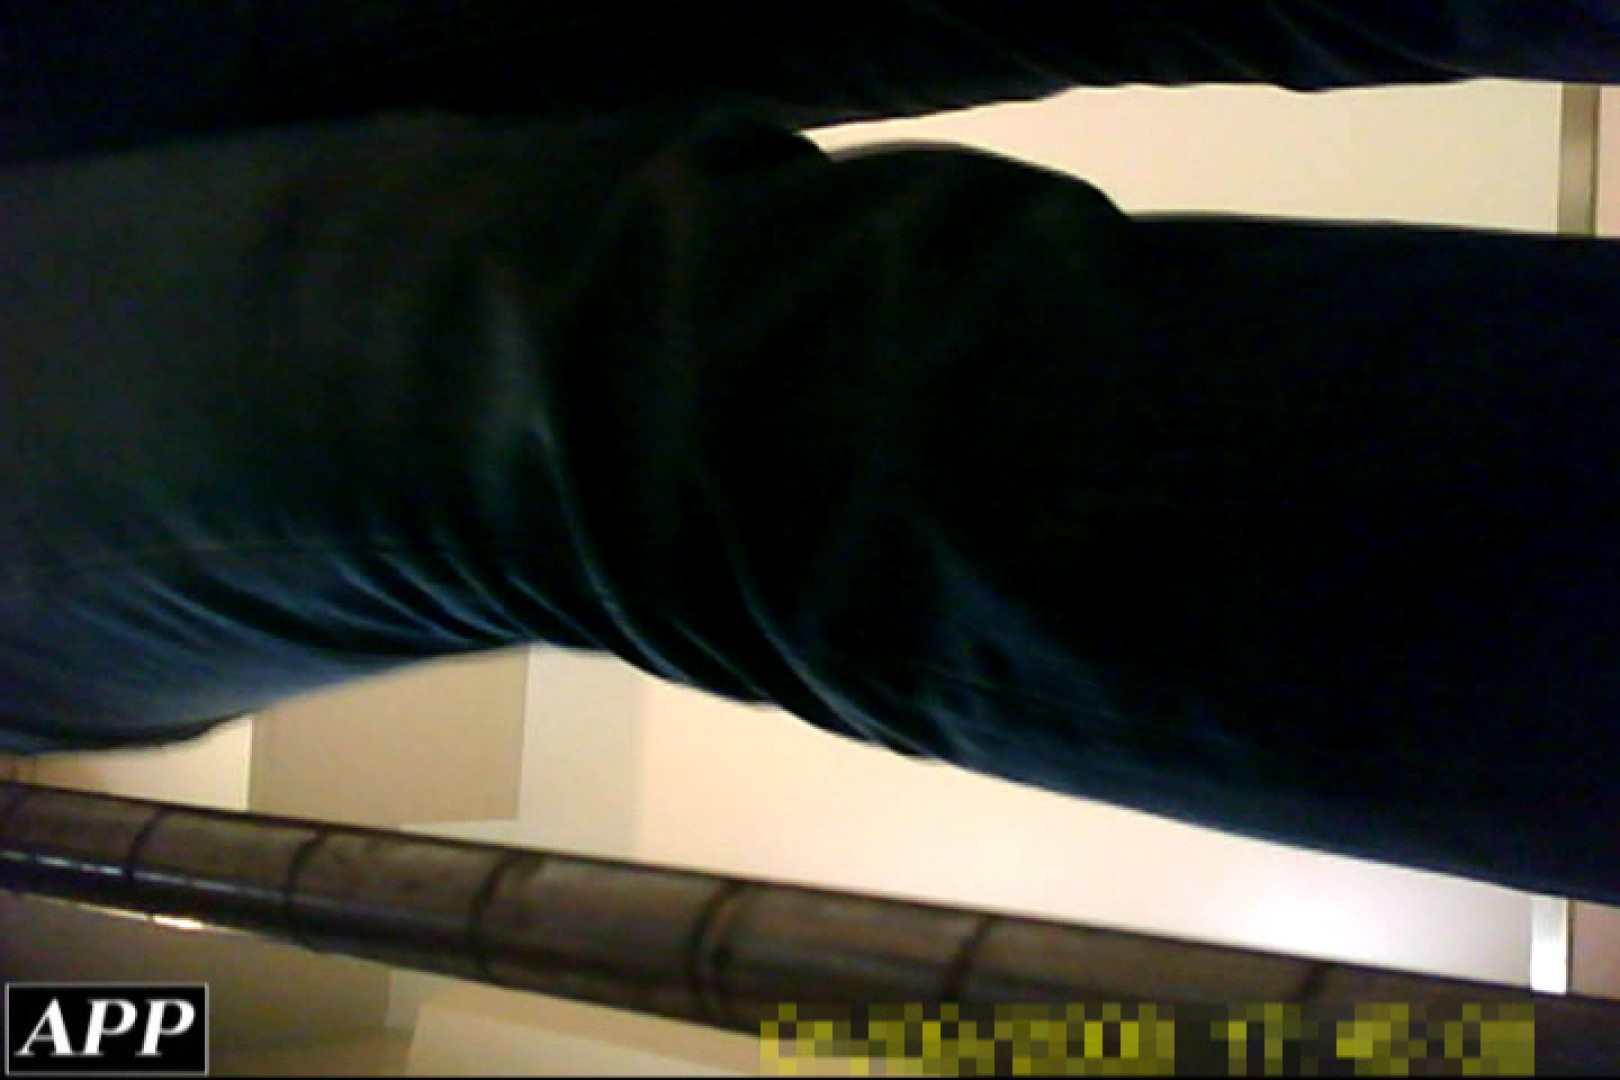 3視点洗面所 vol.037 洗面所 | OLセックス  49画像 31